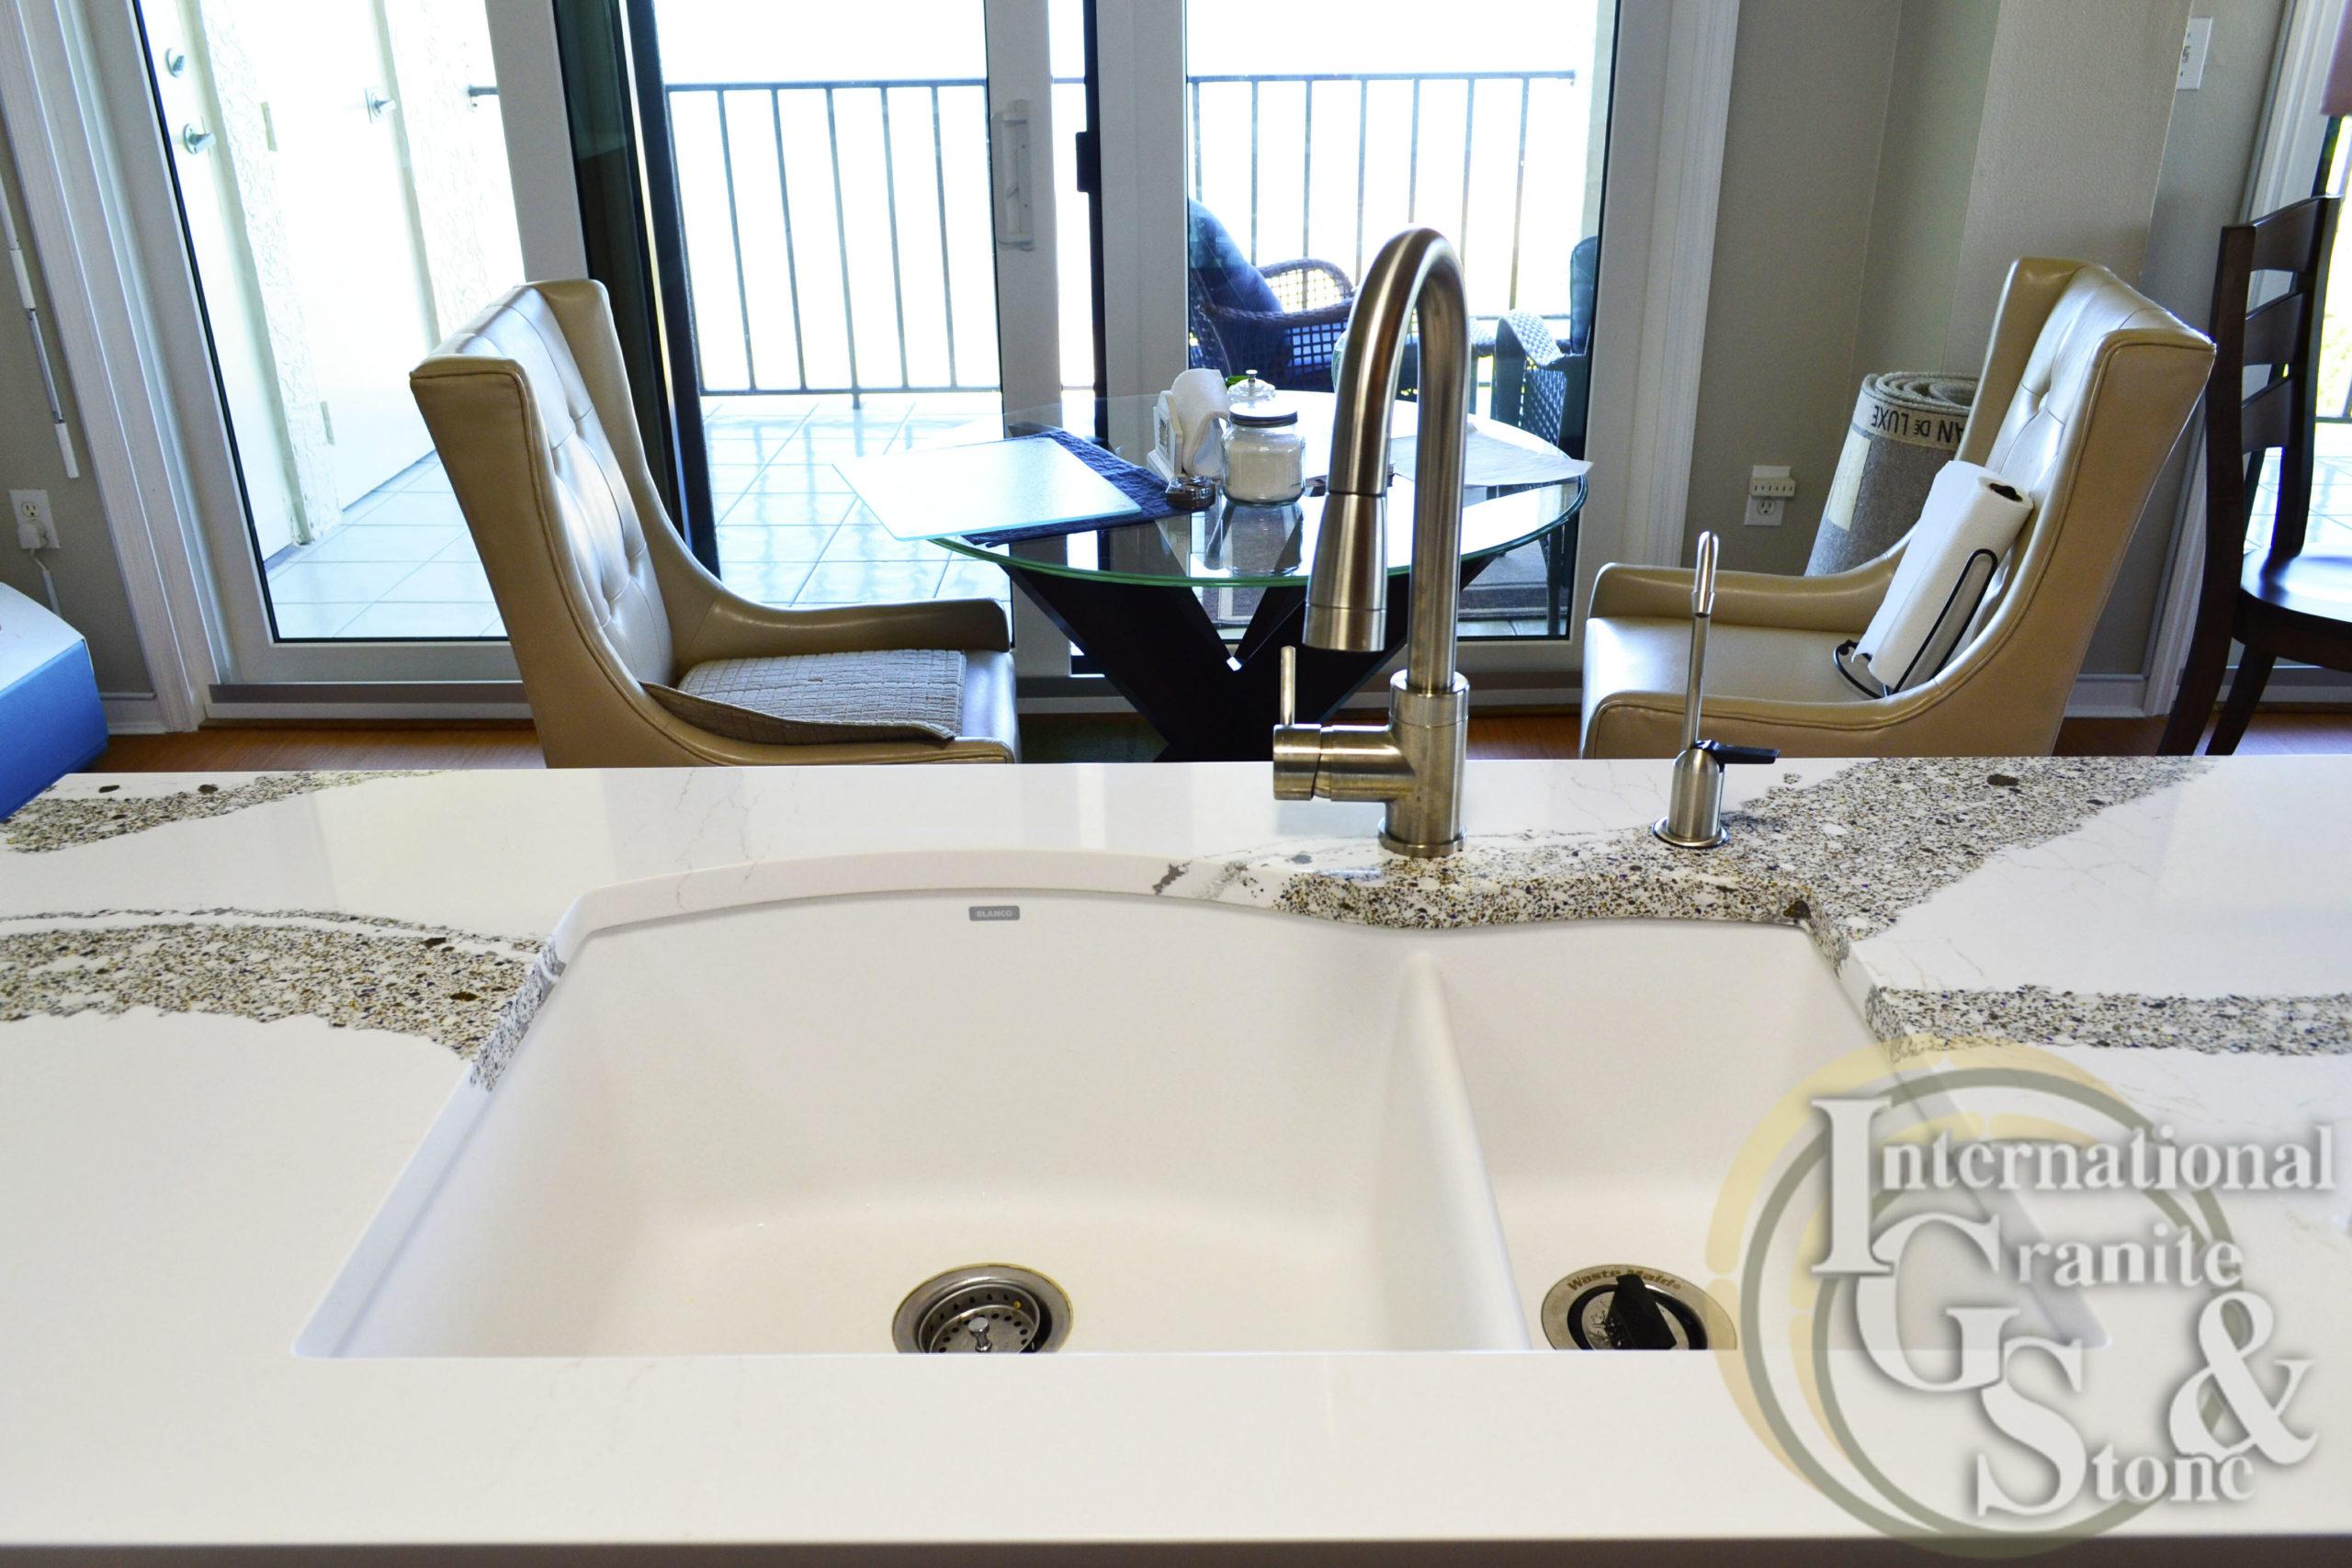 Double White Sink with Quartz